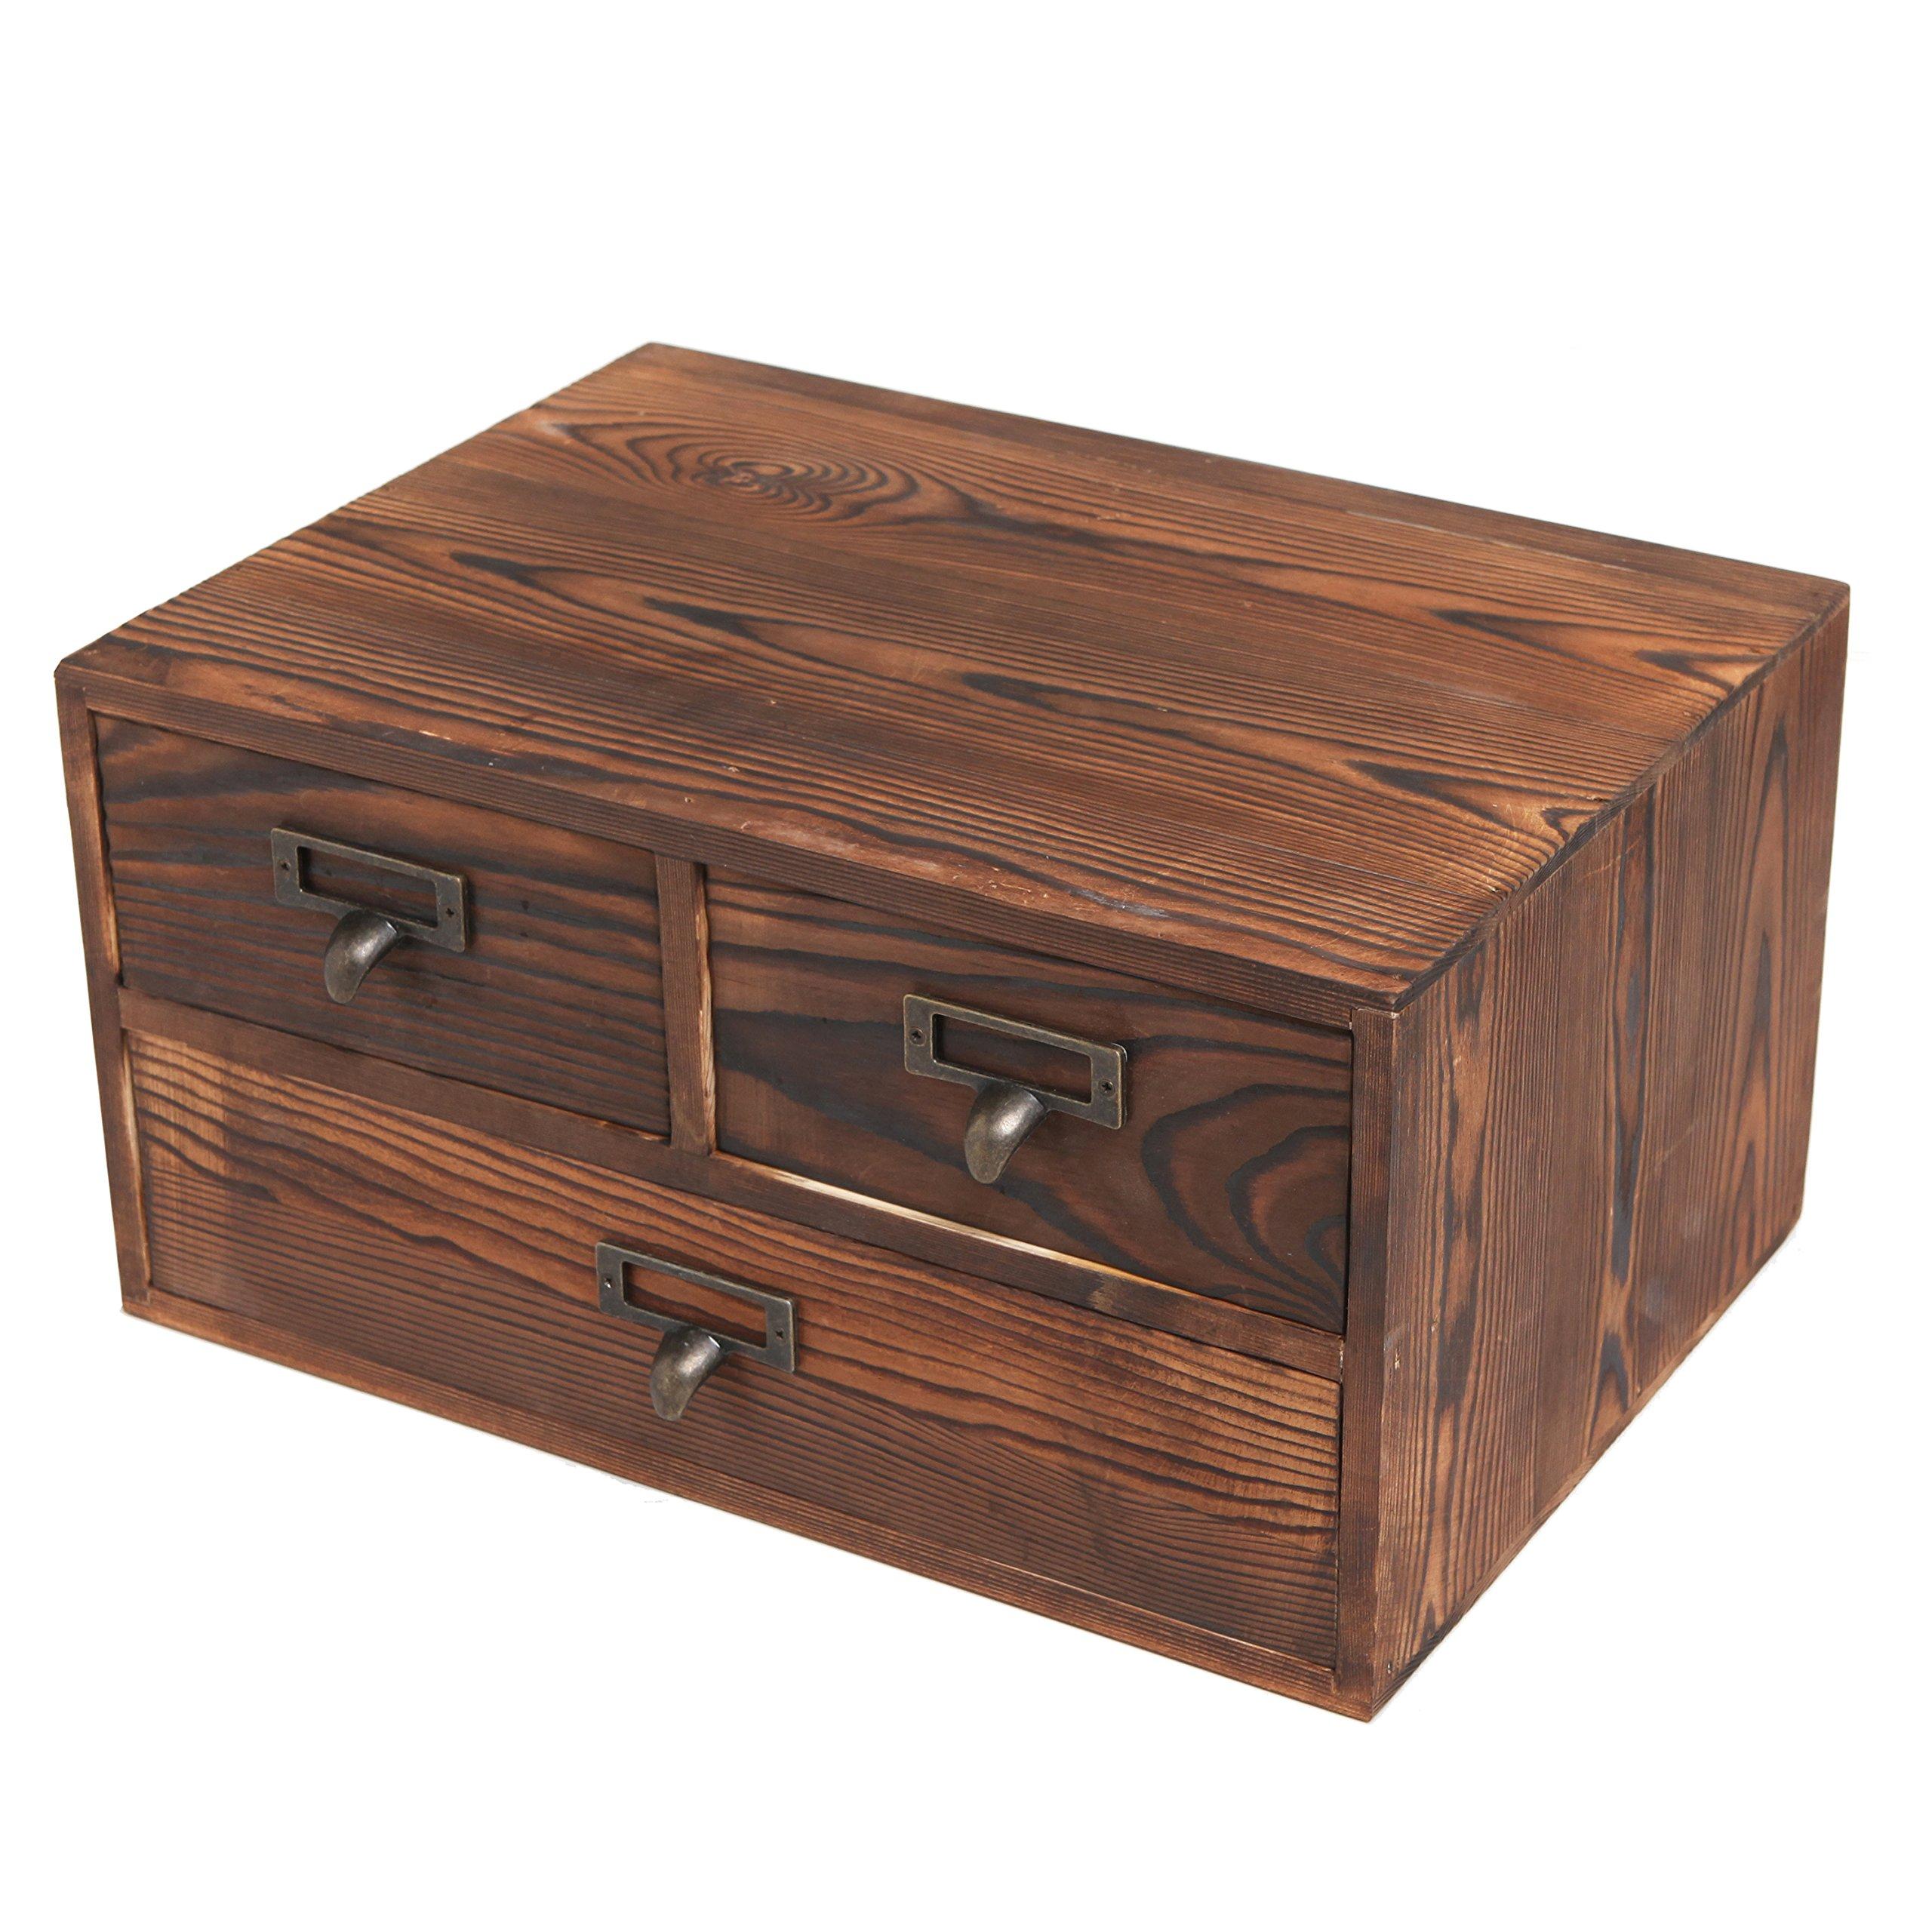 MyGift Small Rustic Dark Brown Wood Office Storage Cabinet/Jewelry Organizer w/ 3 Drawers